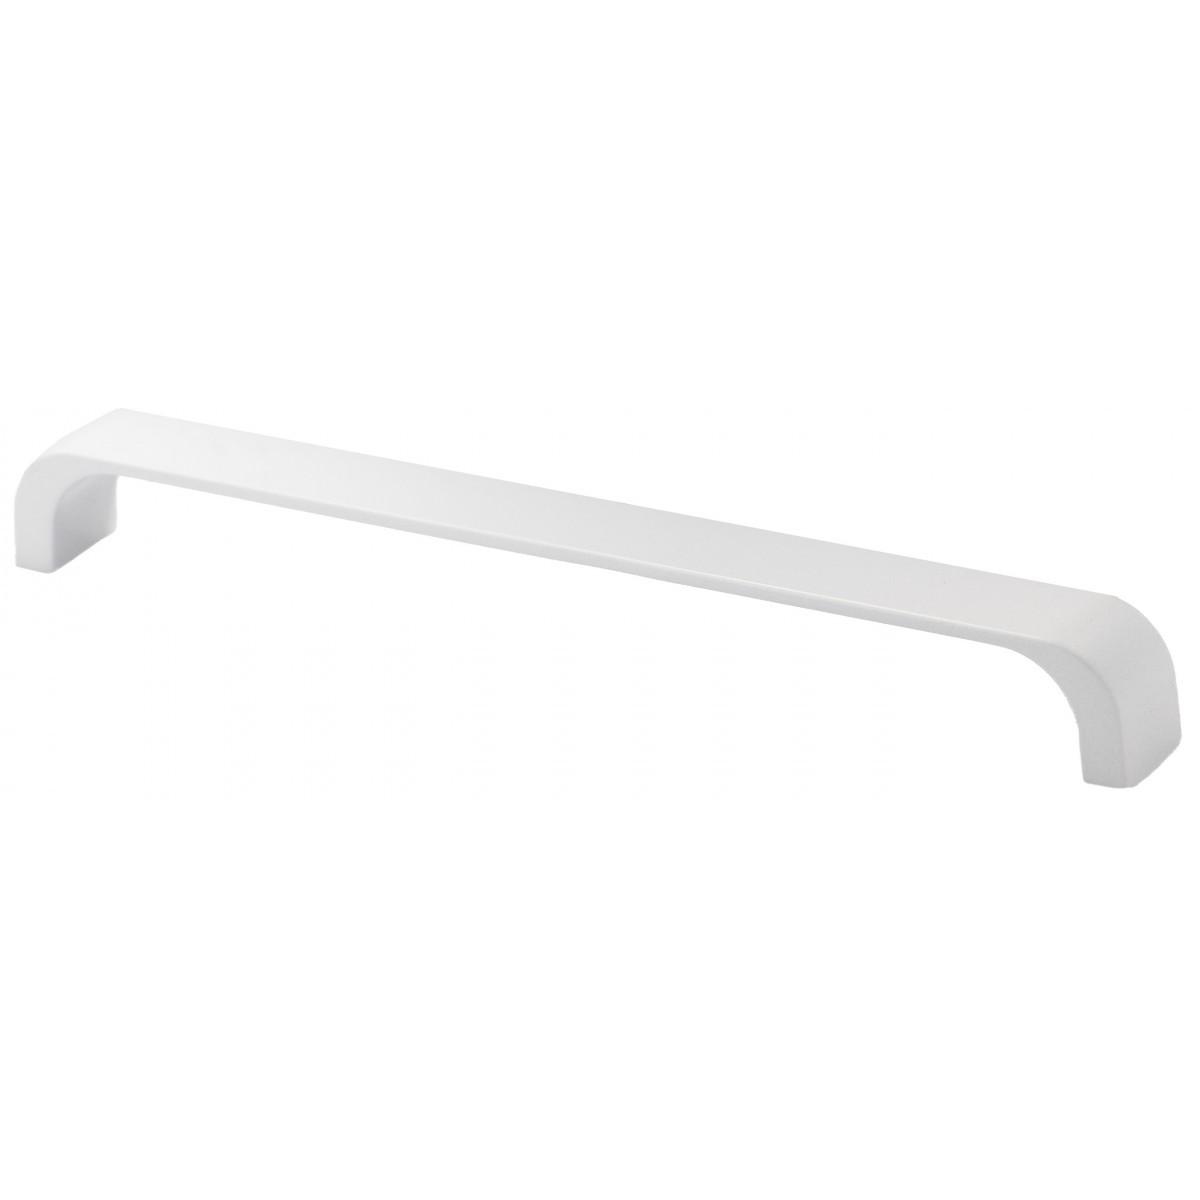 Ручка мебельная Ozkardesler 5221-013 DOLUNAY 192мм Белая